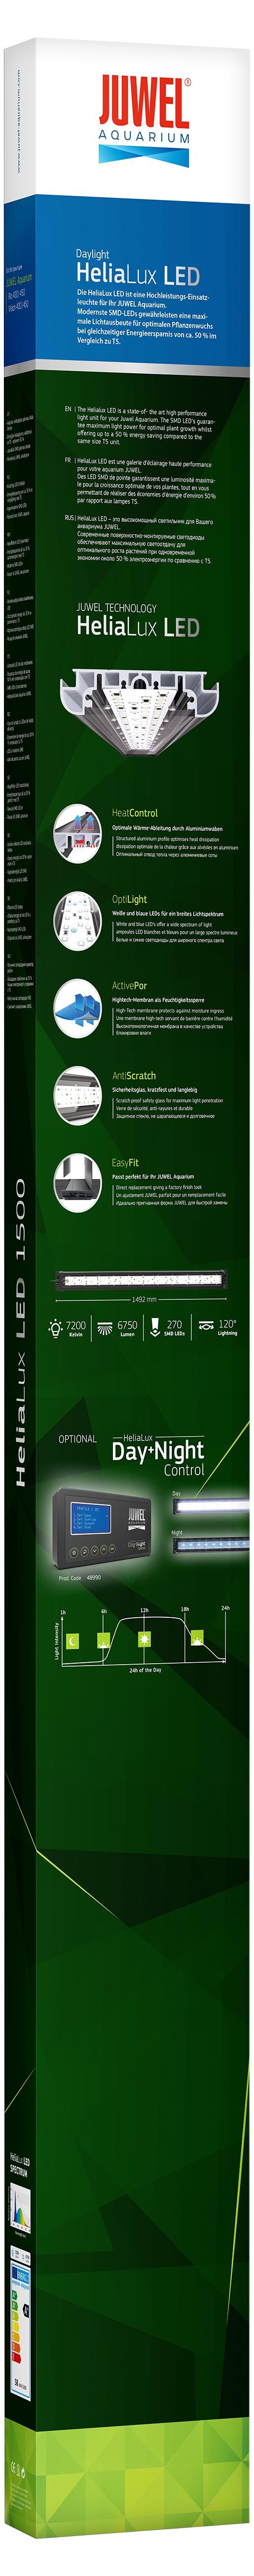 Dienas gaisma akvārijam - Juwel Helia Lux LED 1500, 54 W